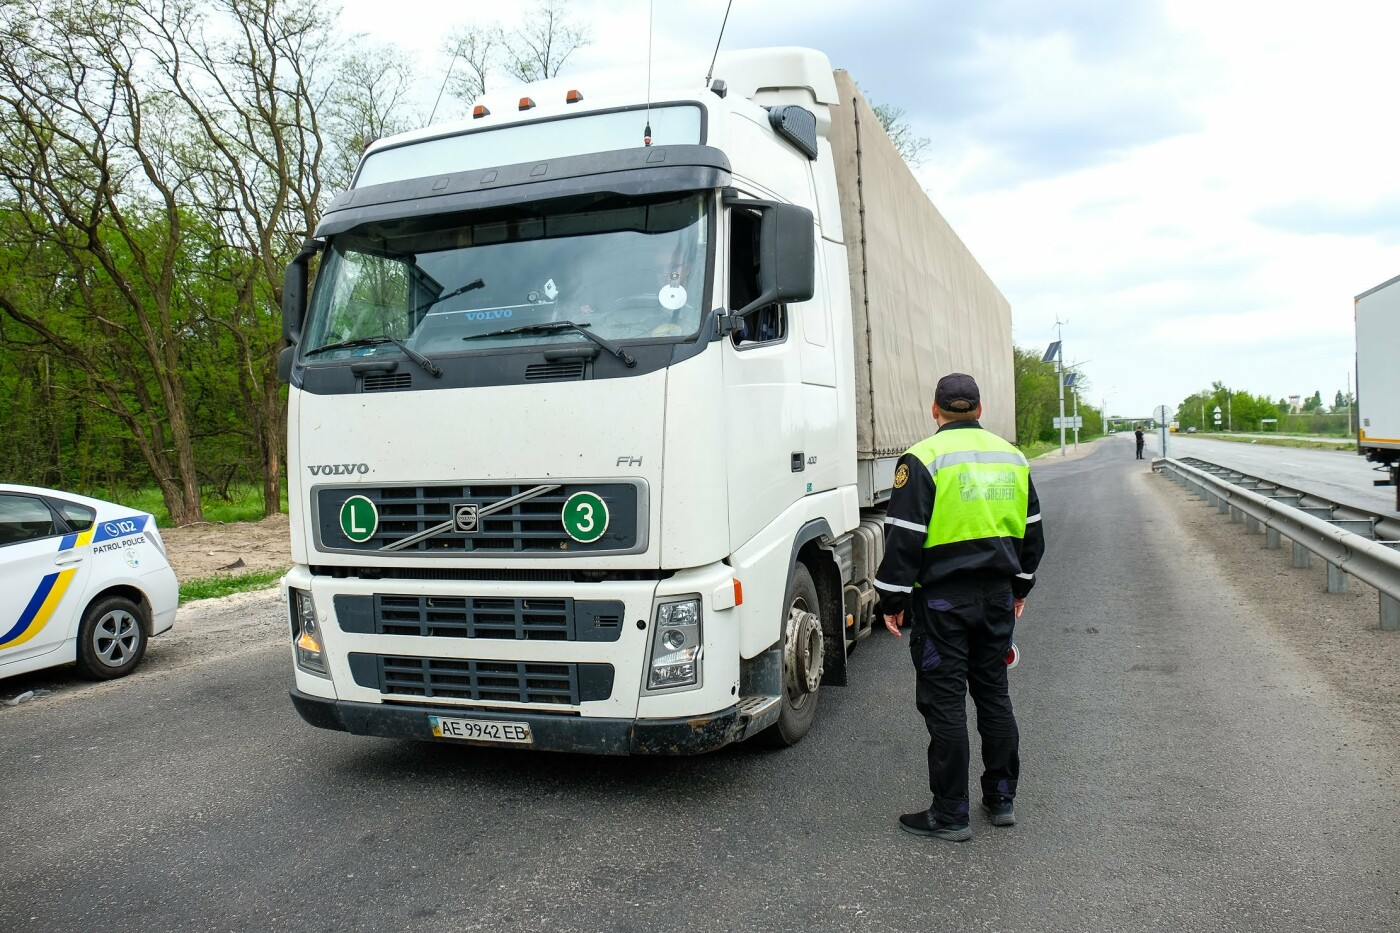 На въездах в Днепр в течение двух месяцев выявили почти 200 фур с перегрузом, - ФОТО, фото-4